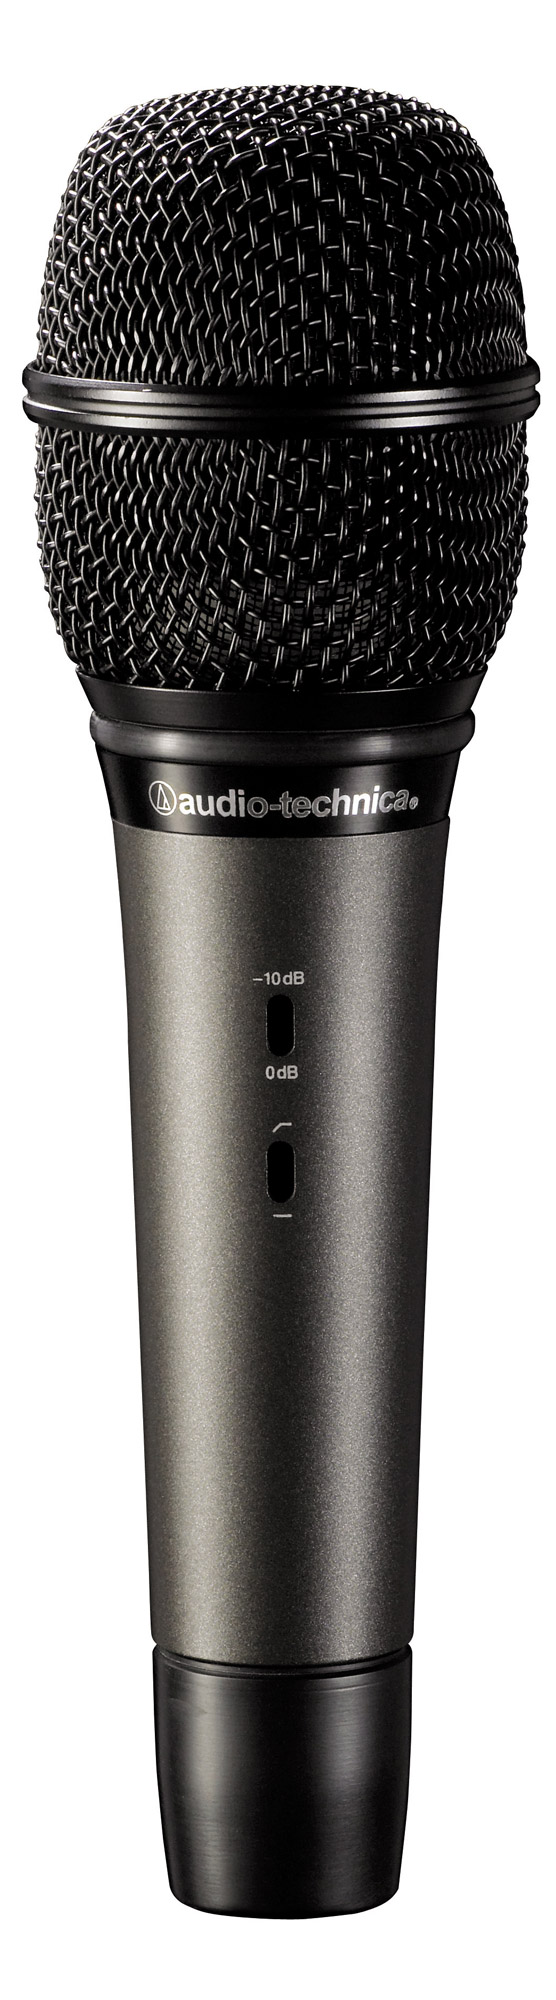 Mikrofone - Audio Technica ATM710 Kondensator Gesangsmikrofon Retoure (Zustand sehr gut) - Onlineshop Musikhaus Kirstein